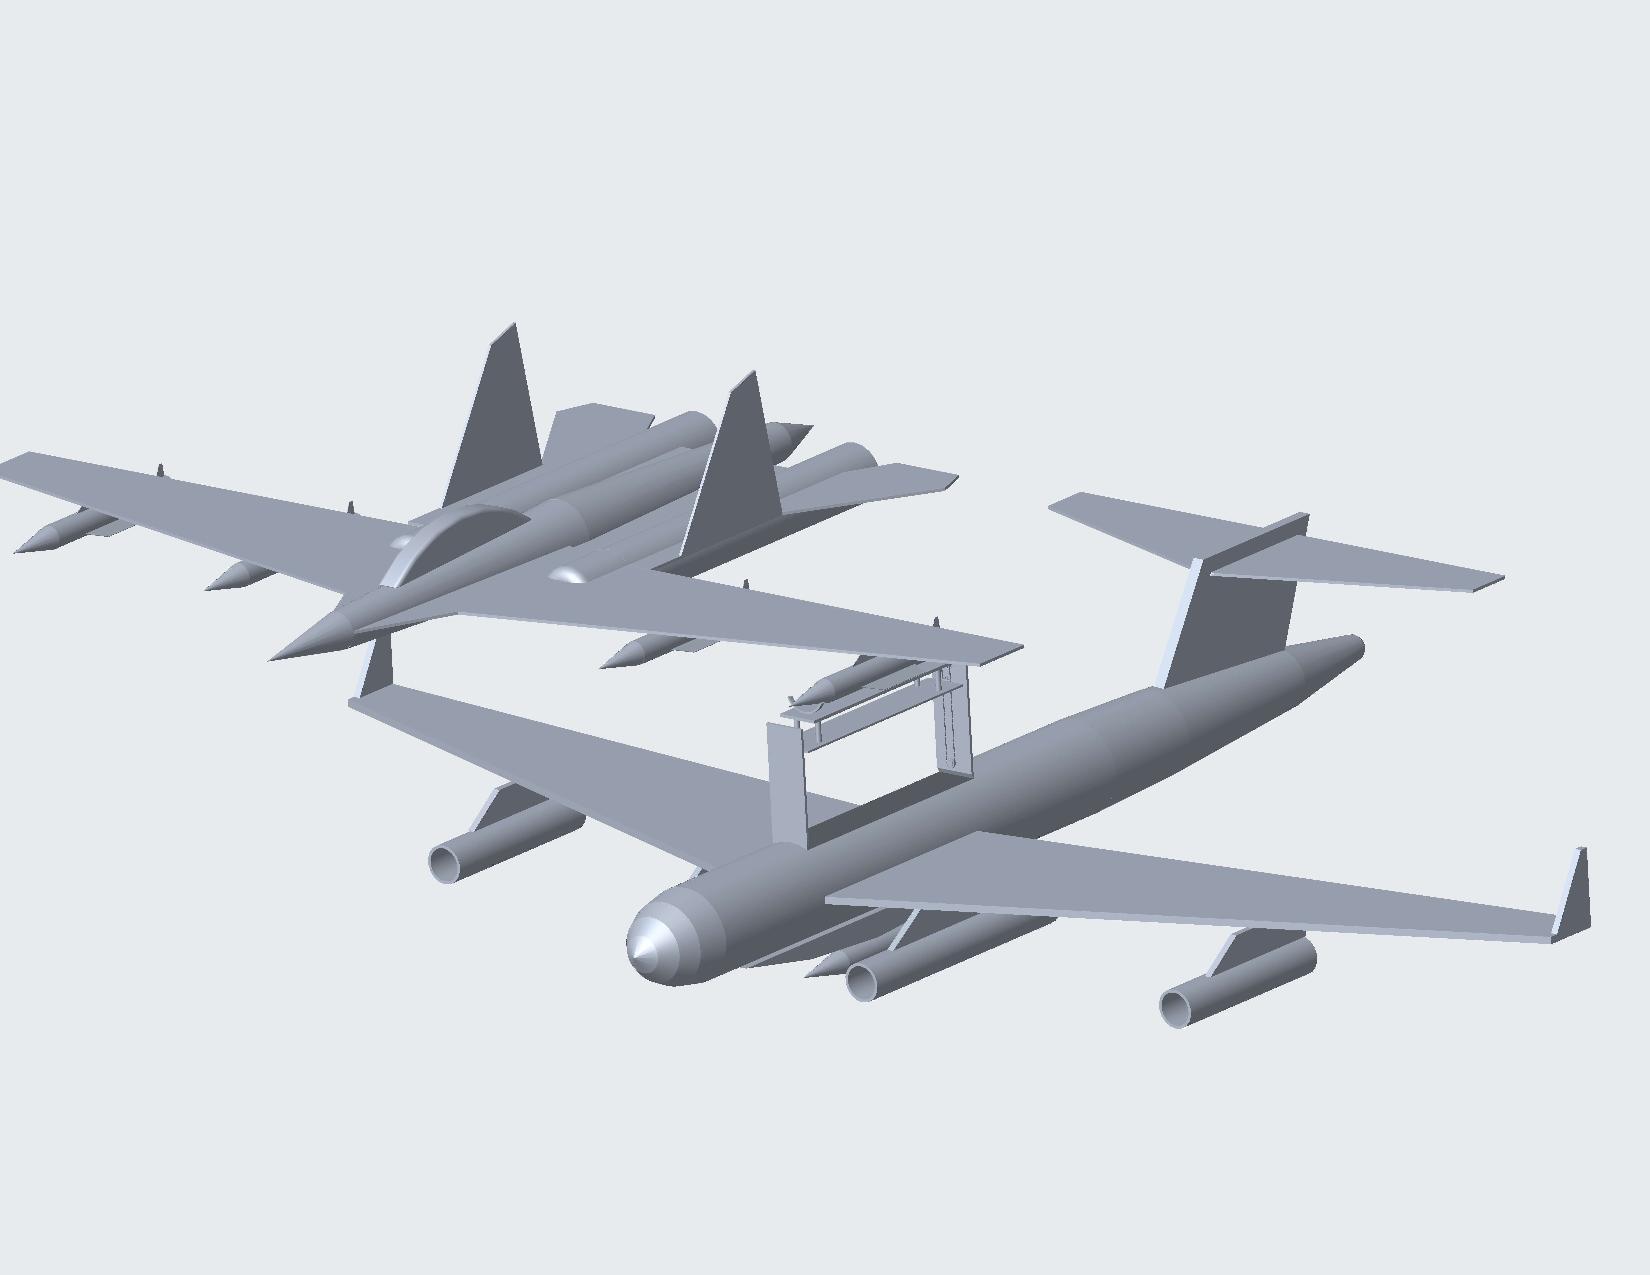 isometric-page-001.jpg Download STL file Dassault Rafale fighter jet • Model to 3D print, brijenggworks